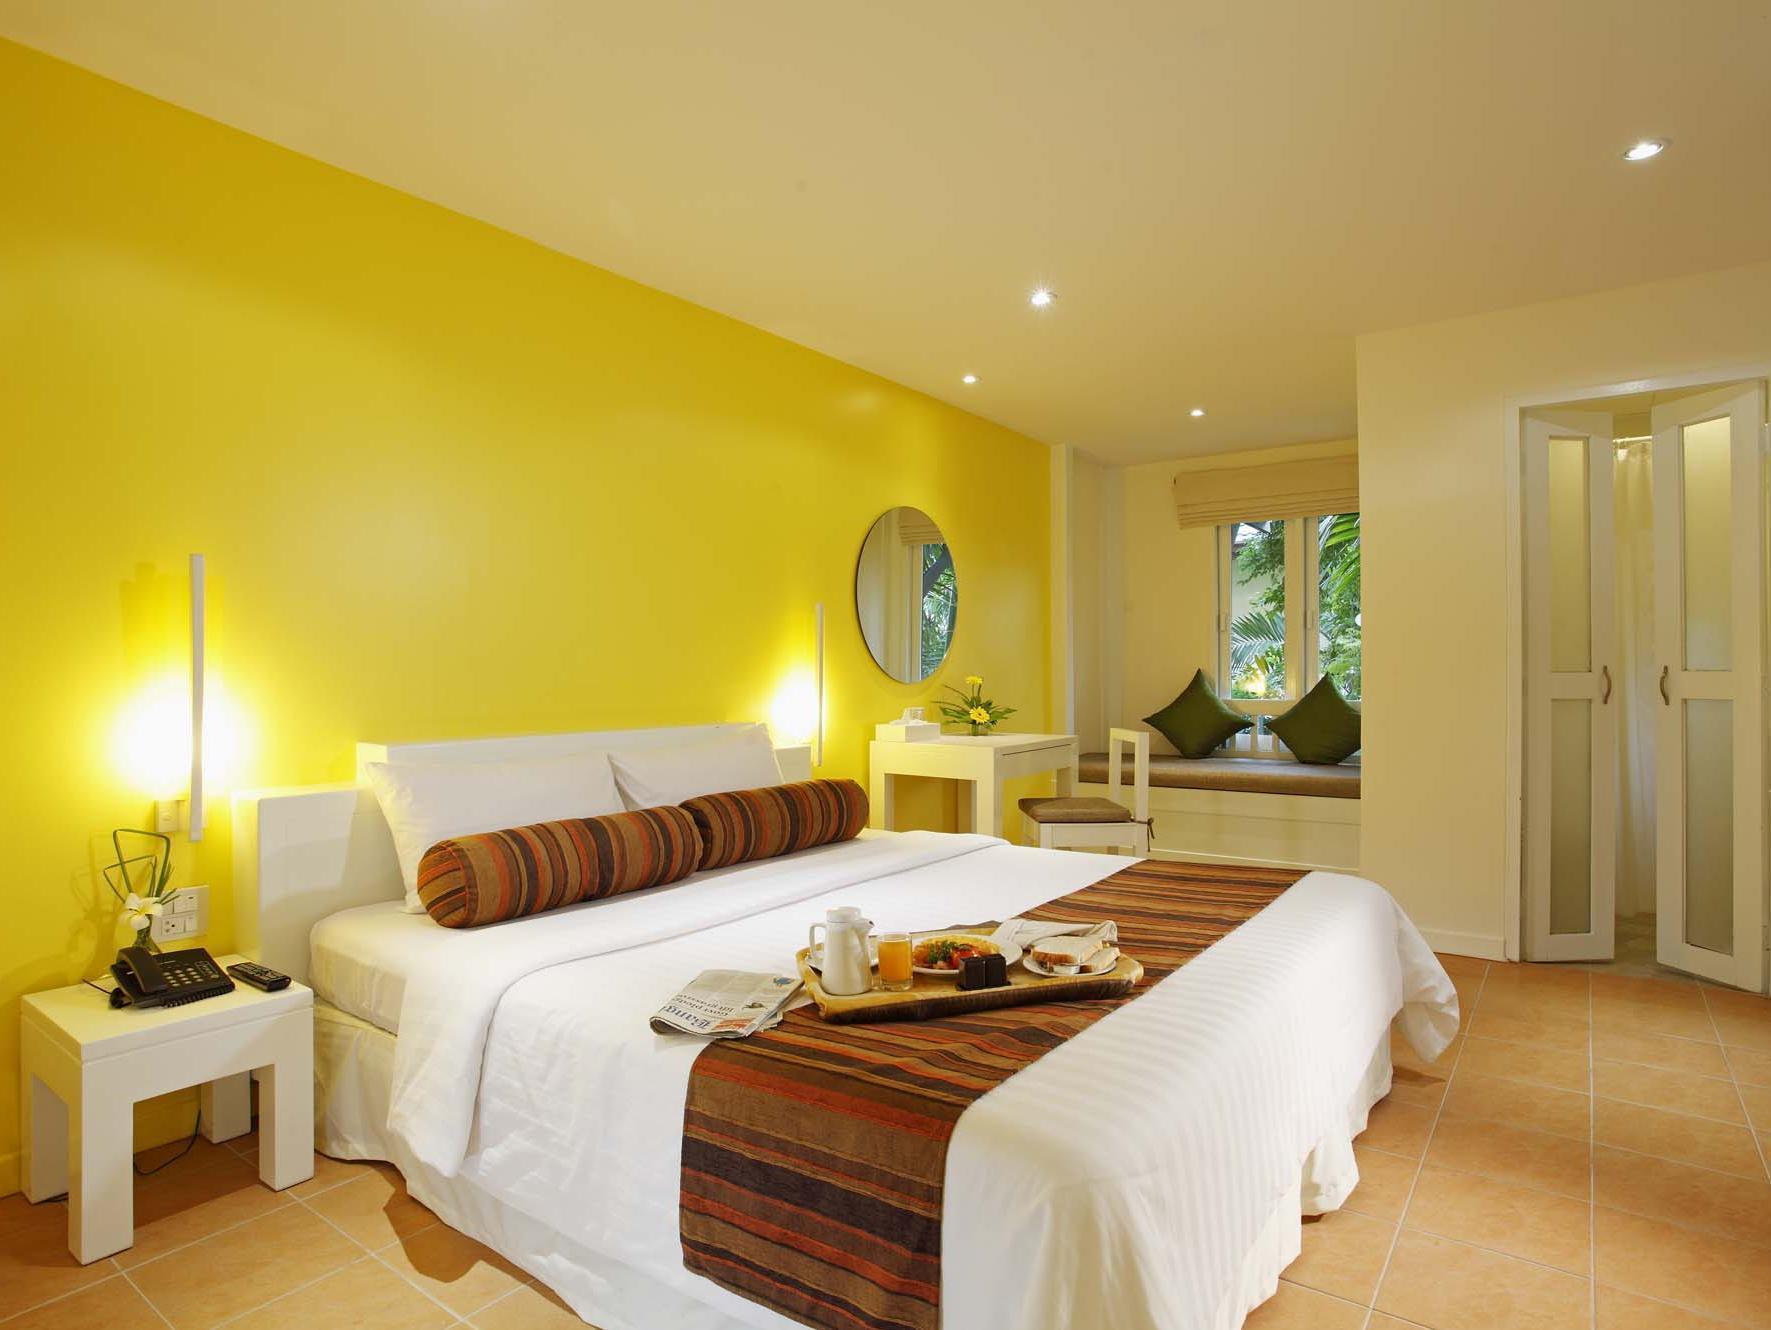 The Phulin Resort 3 (Phuket, Karon, Thailand): hotel description, service, reviews 96